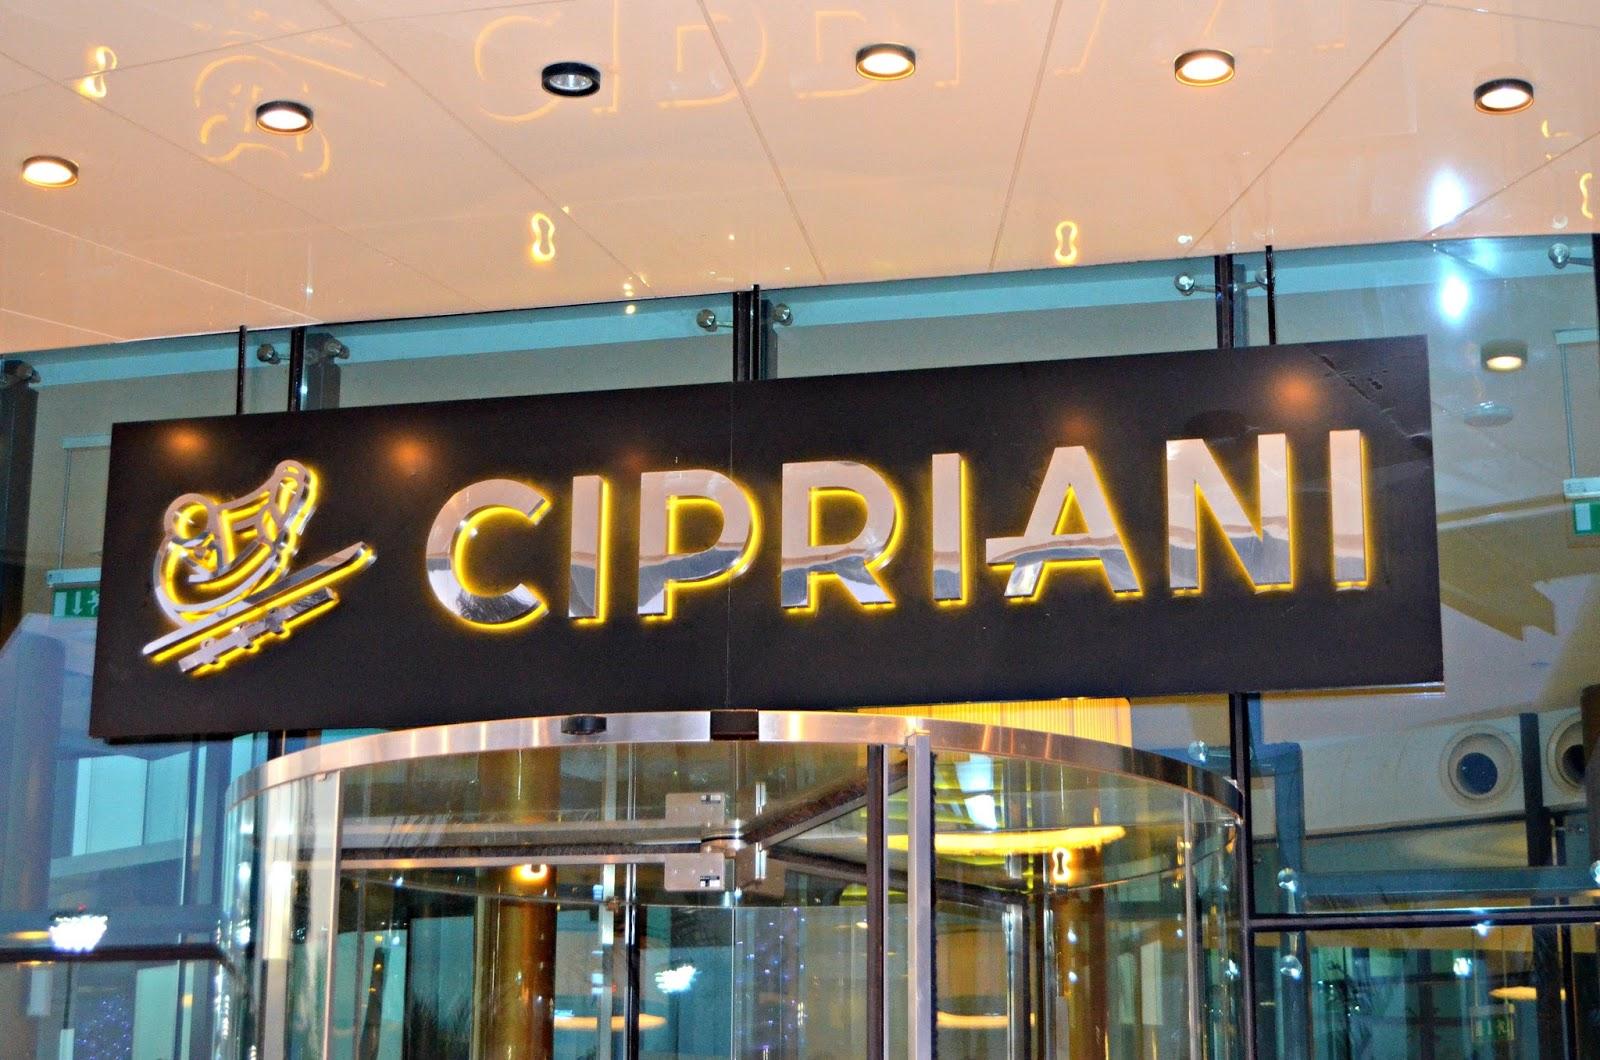 The bandwagon chic cipriani abu dhabi for Ristorante cipriani abu dhabi